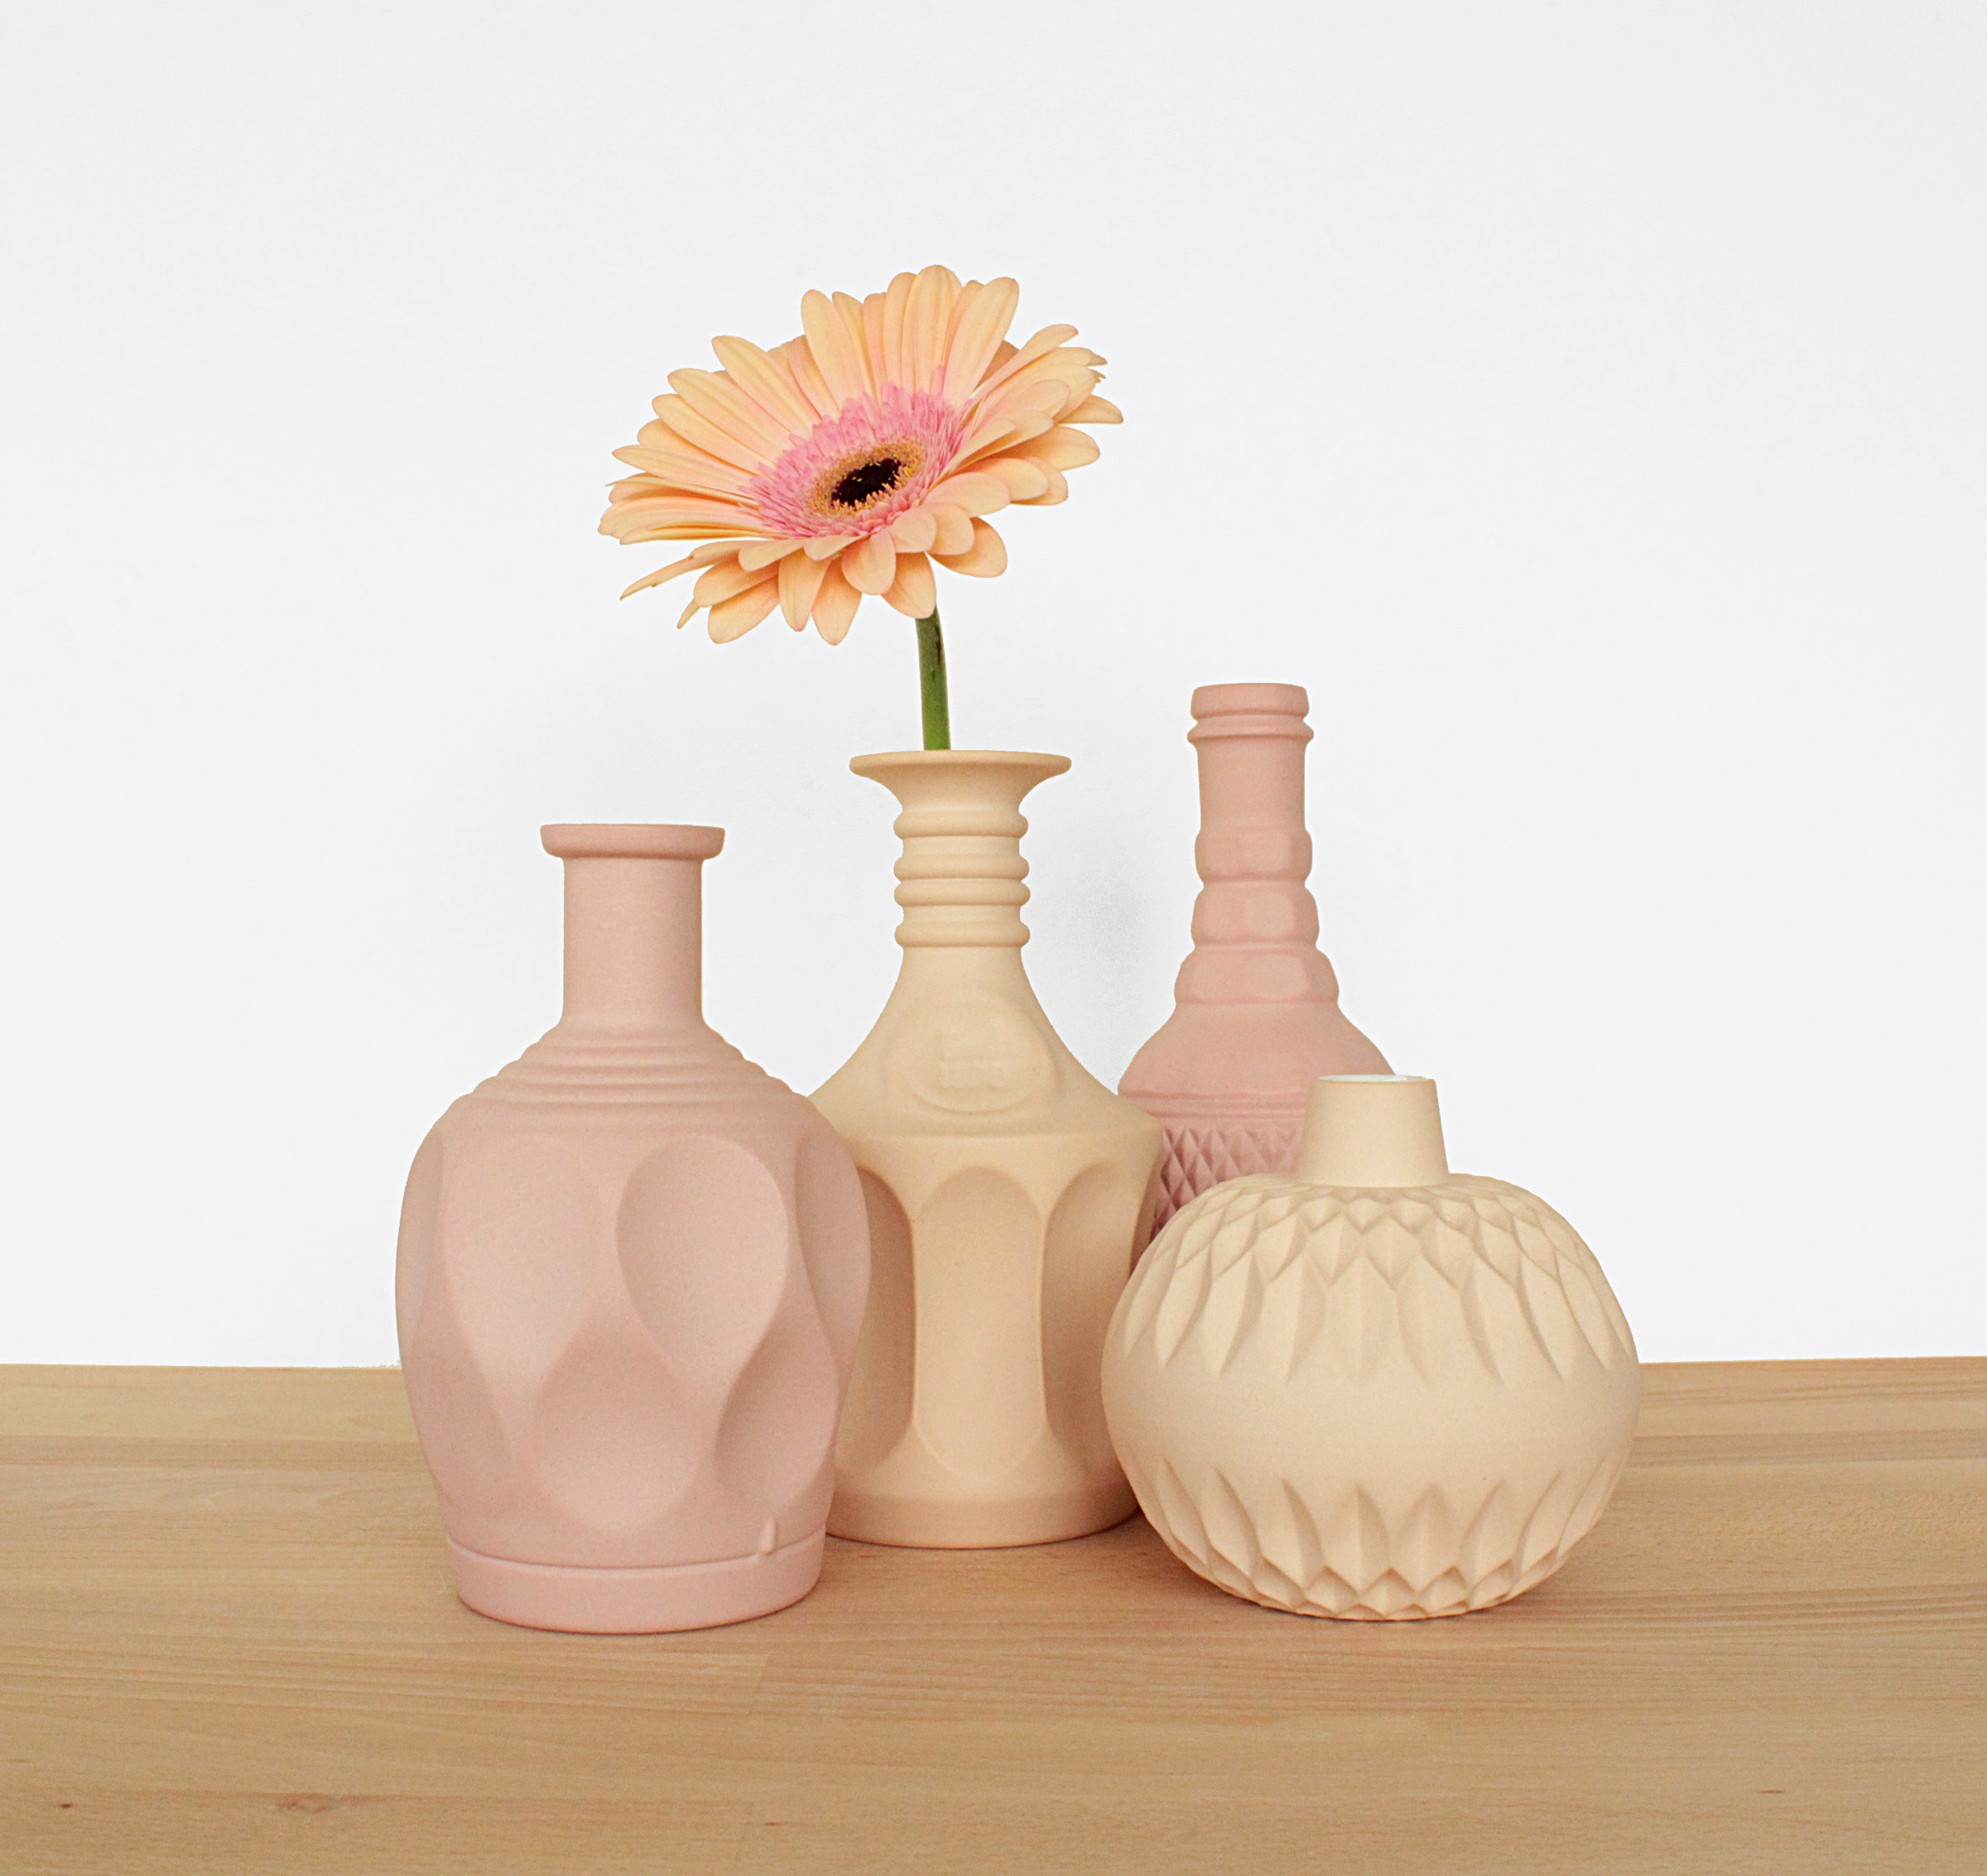 Vases Peach and Pink.jpg